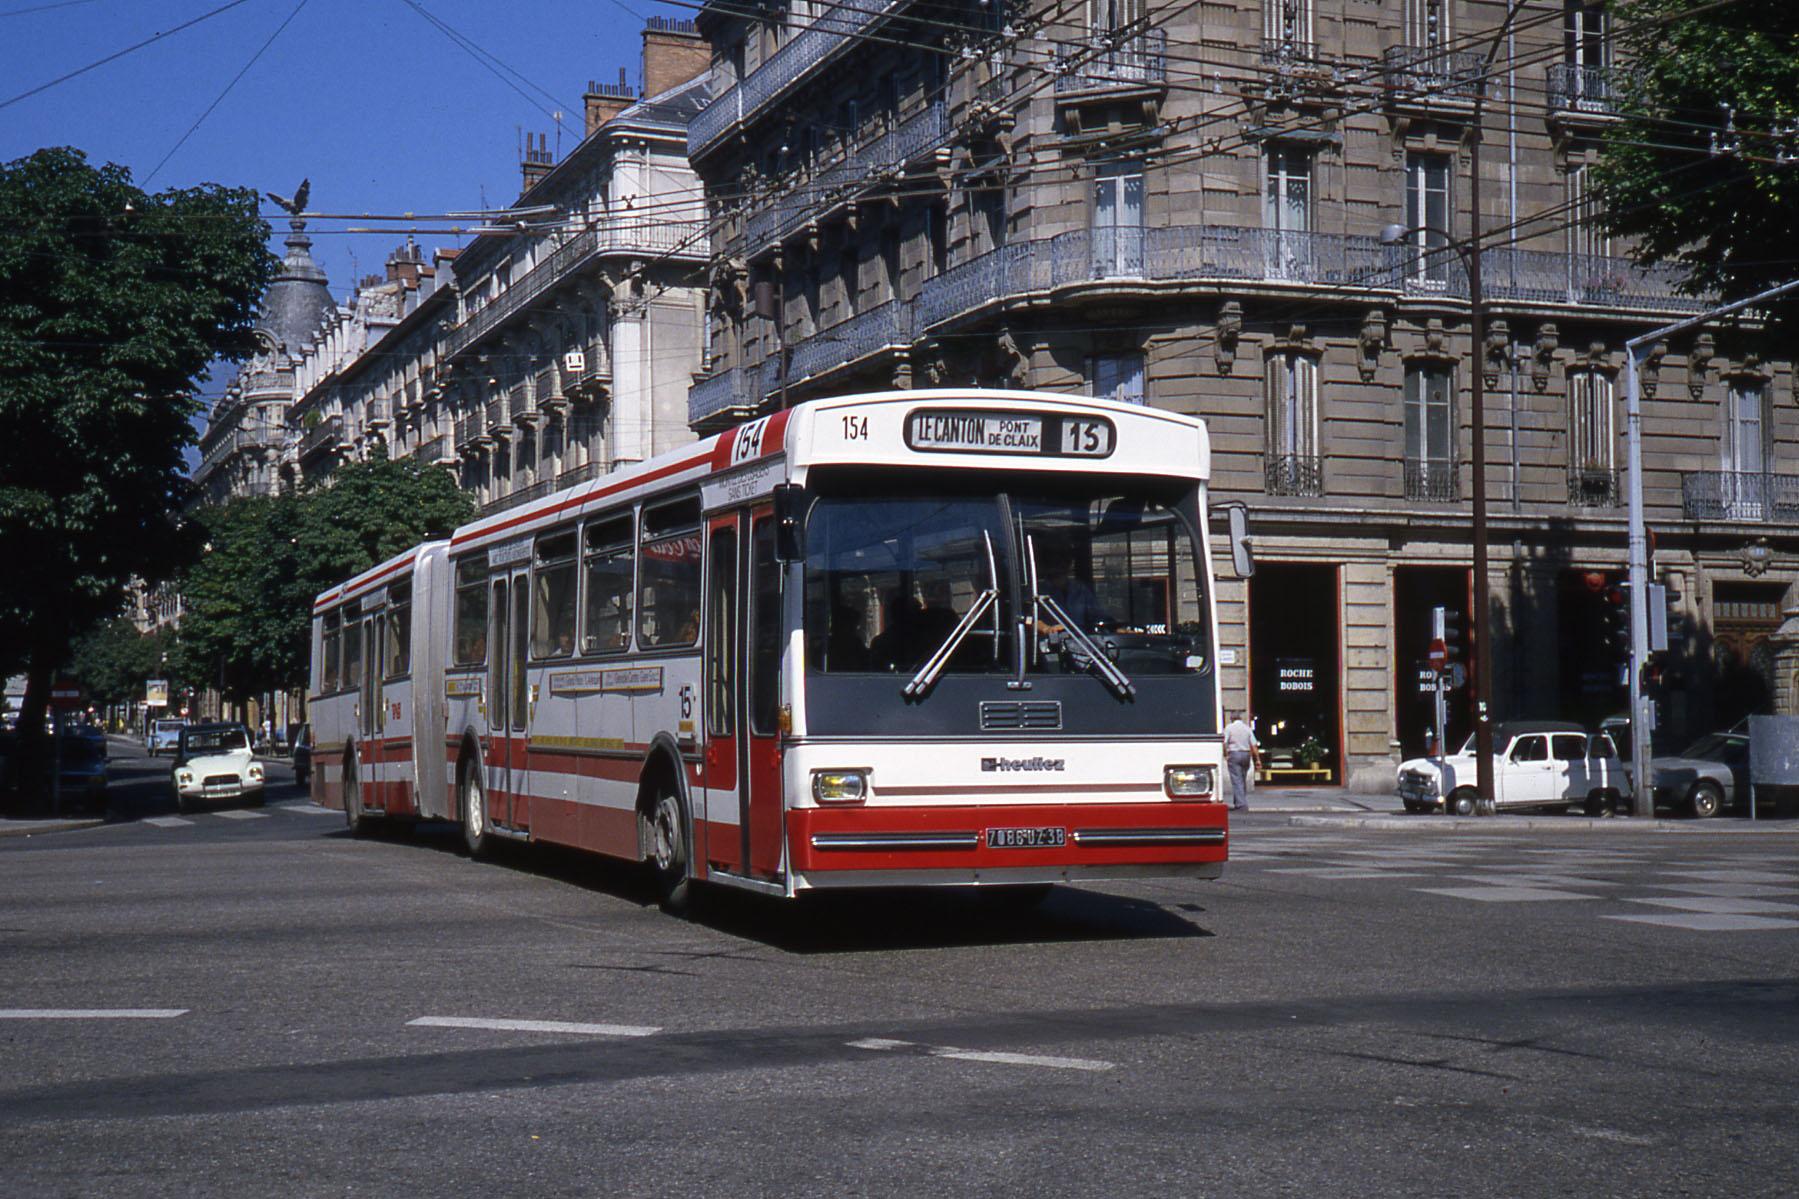 File:JHM-1980-1474 - Heuliez O 305 G - Grenoble.jpg